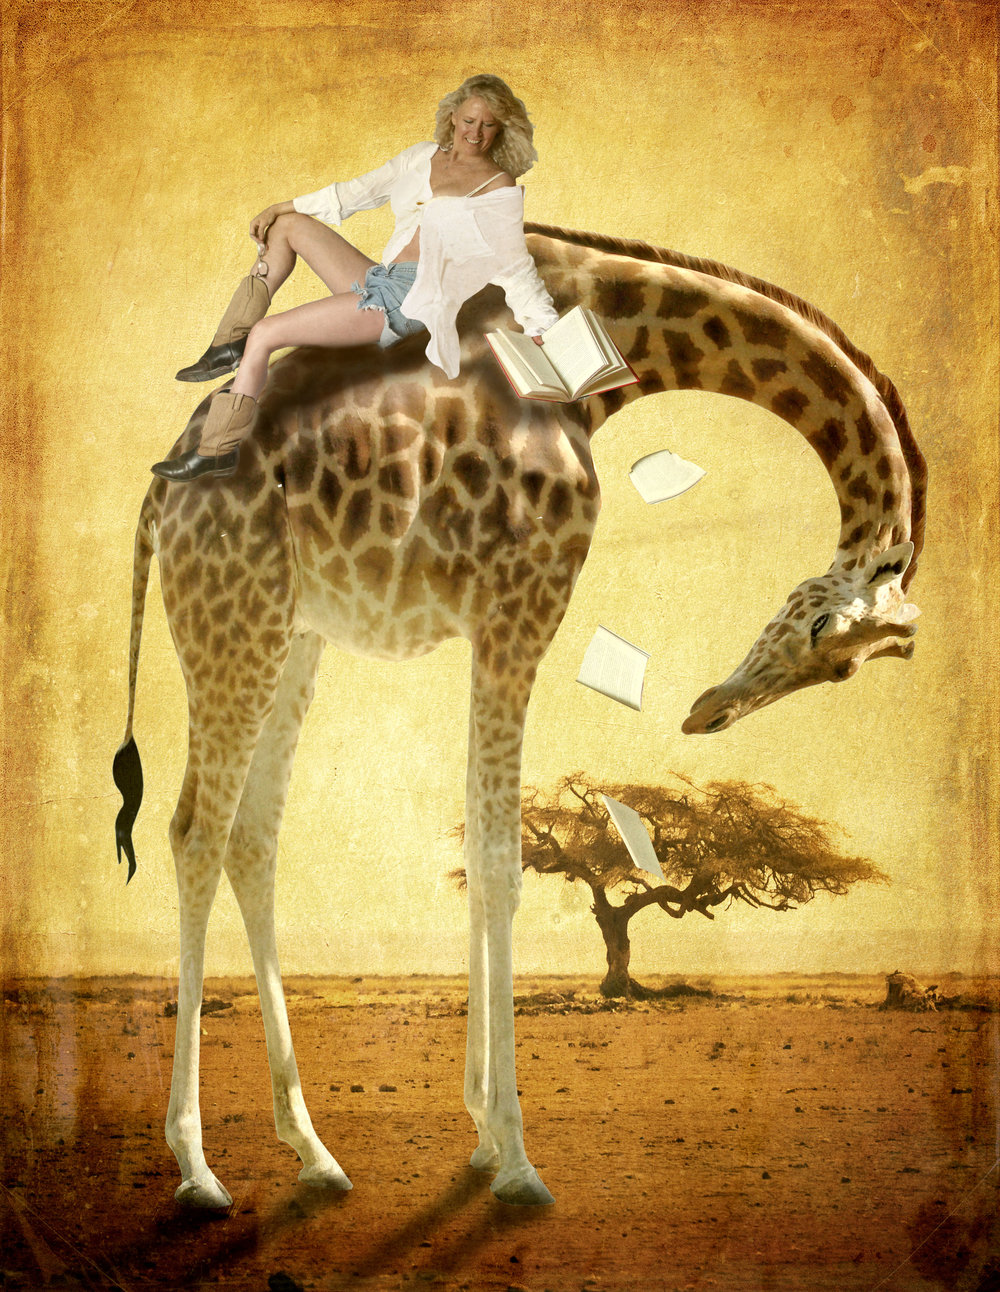 me and giraffe w blouse.jpg